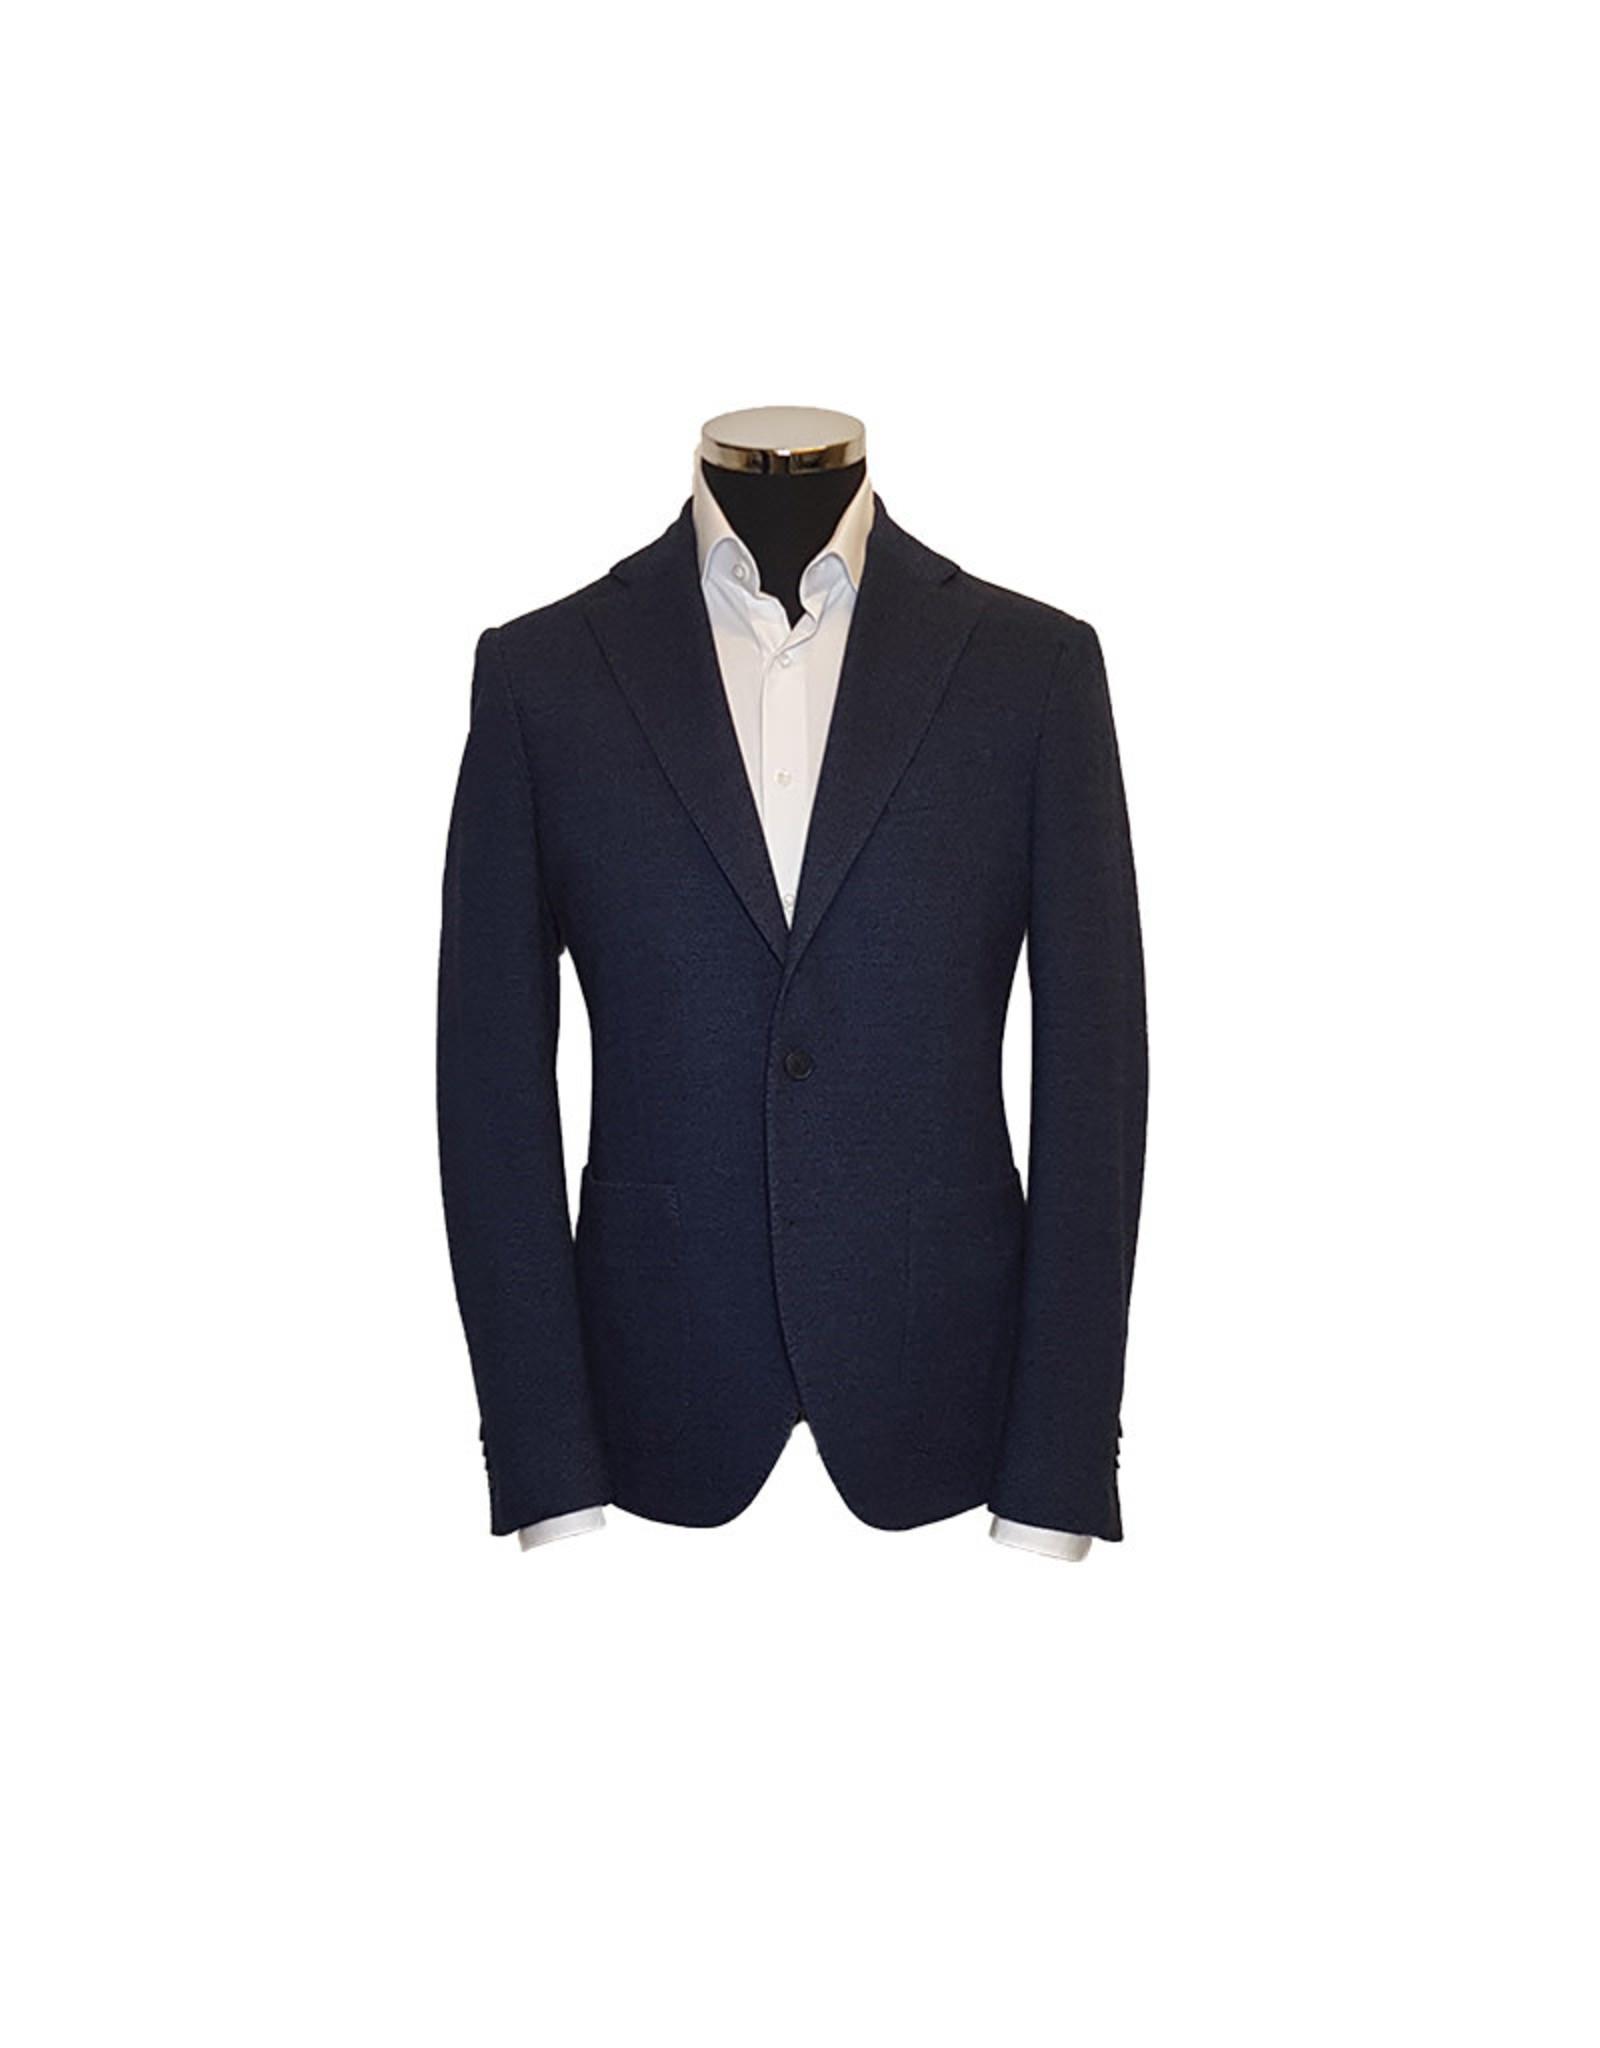 Latorre Gabiati vest blauw Maglie JA2031